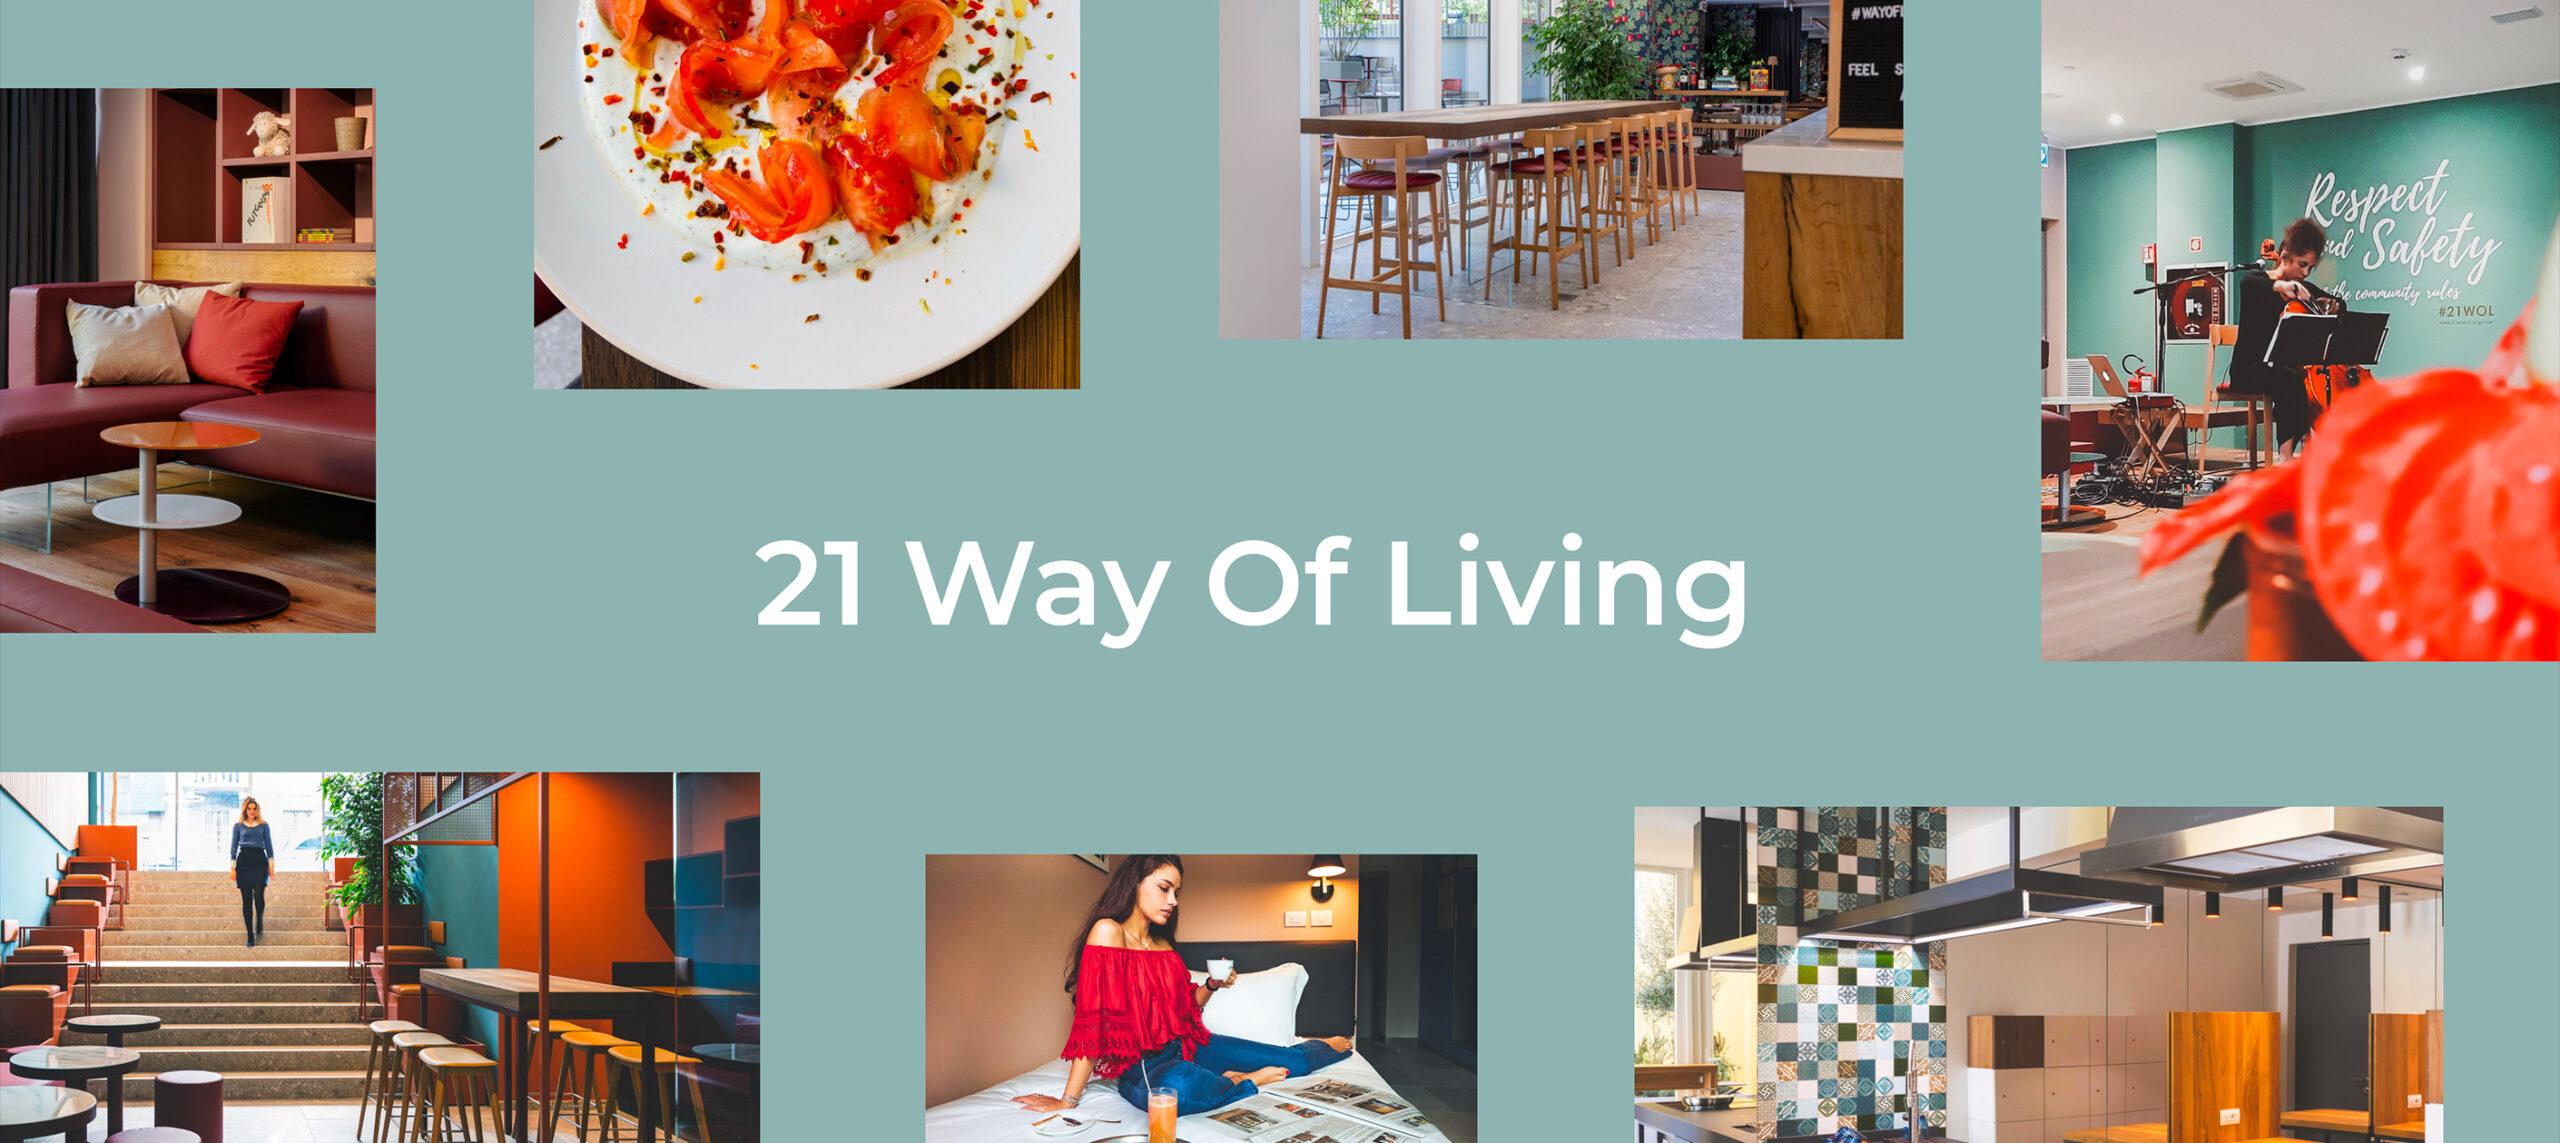 21 Way Of Living